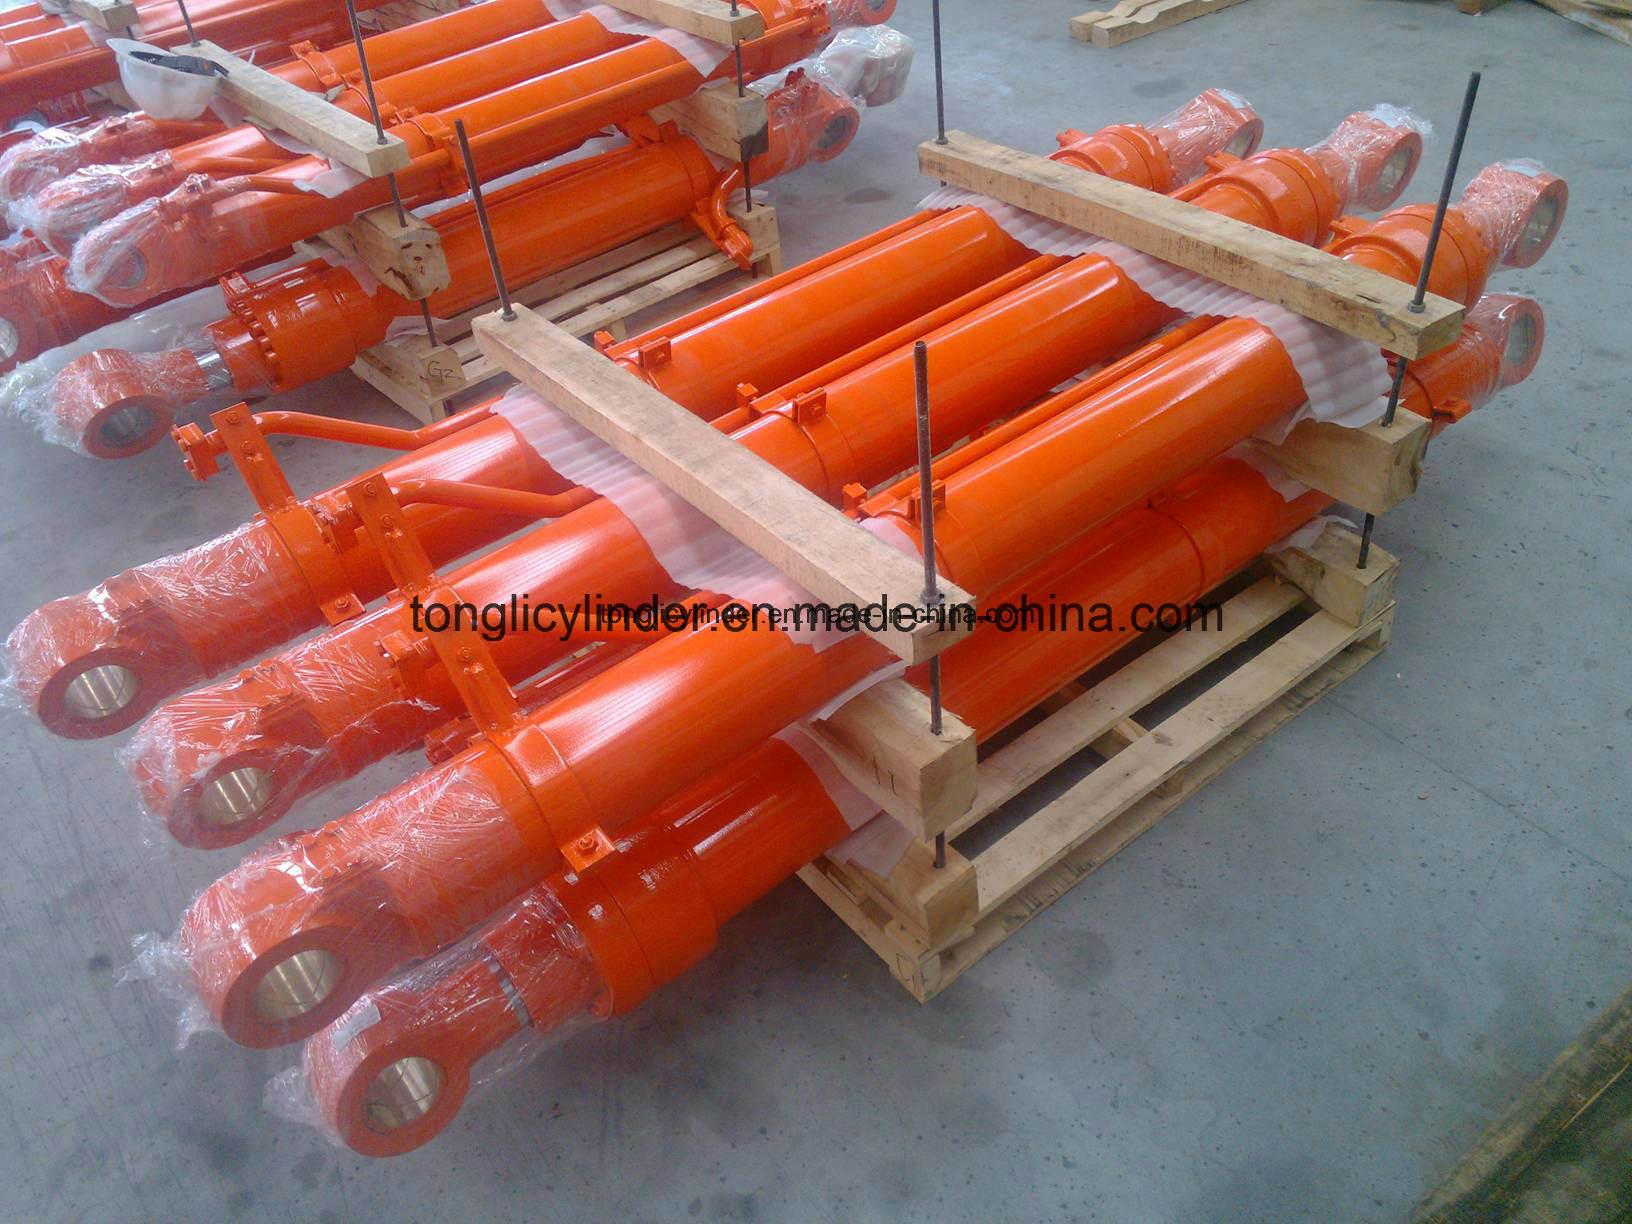 Dh220 Hydraulic Bucket Cylinder for Doosan Excavator